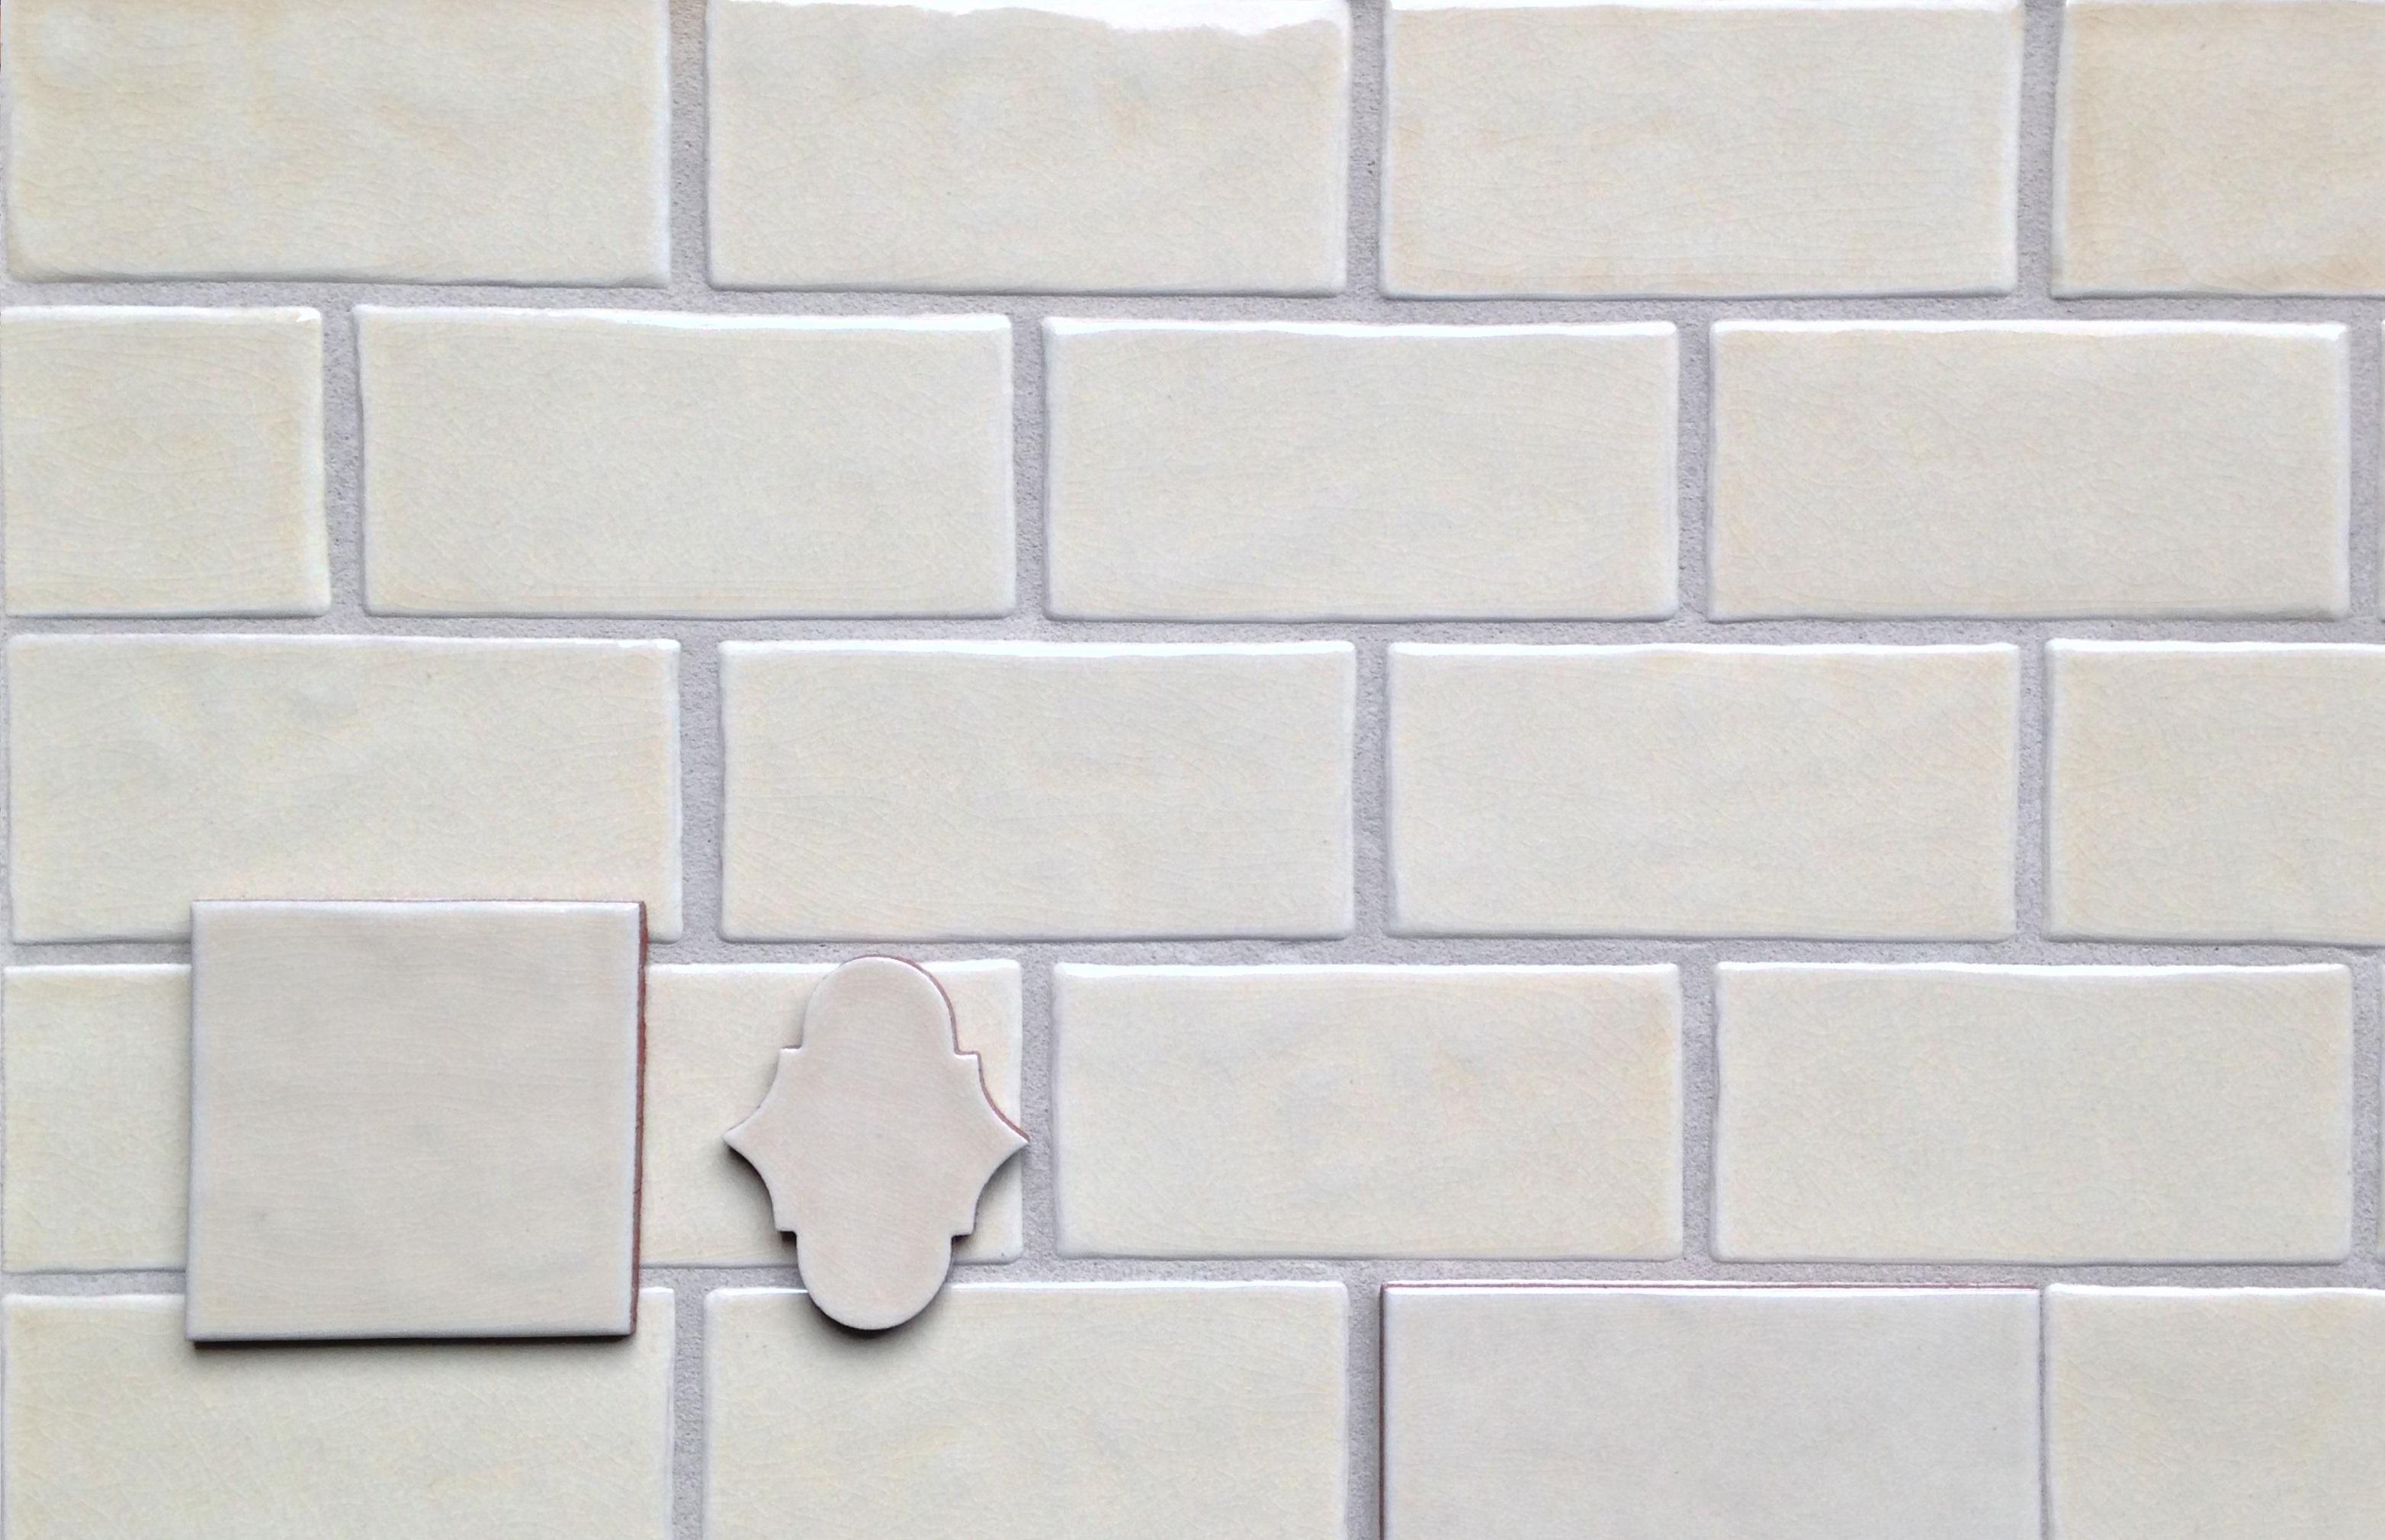 Nice 12X12 Ceiling Tiles Thick 2 X 8 Subway Tile Square 24 Ceramic Tile 24 X 24 Ceiling Tiles Youthful 24X24 Ceiling Tiles Bright2X2 Floor Tile World Mosaic Tile | Ceramica Antigua | Tiles Vancouver, Mosaic Tiles